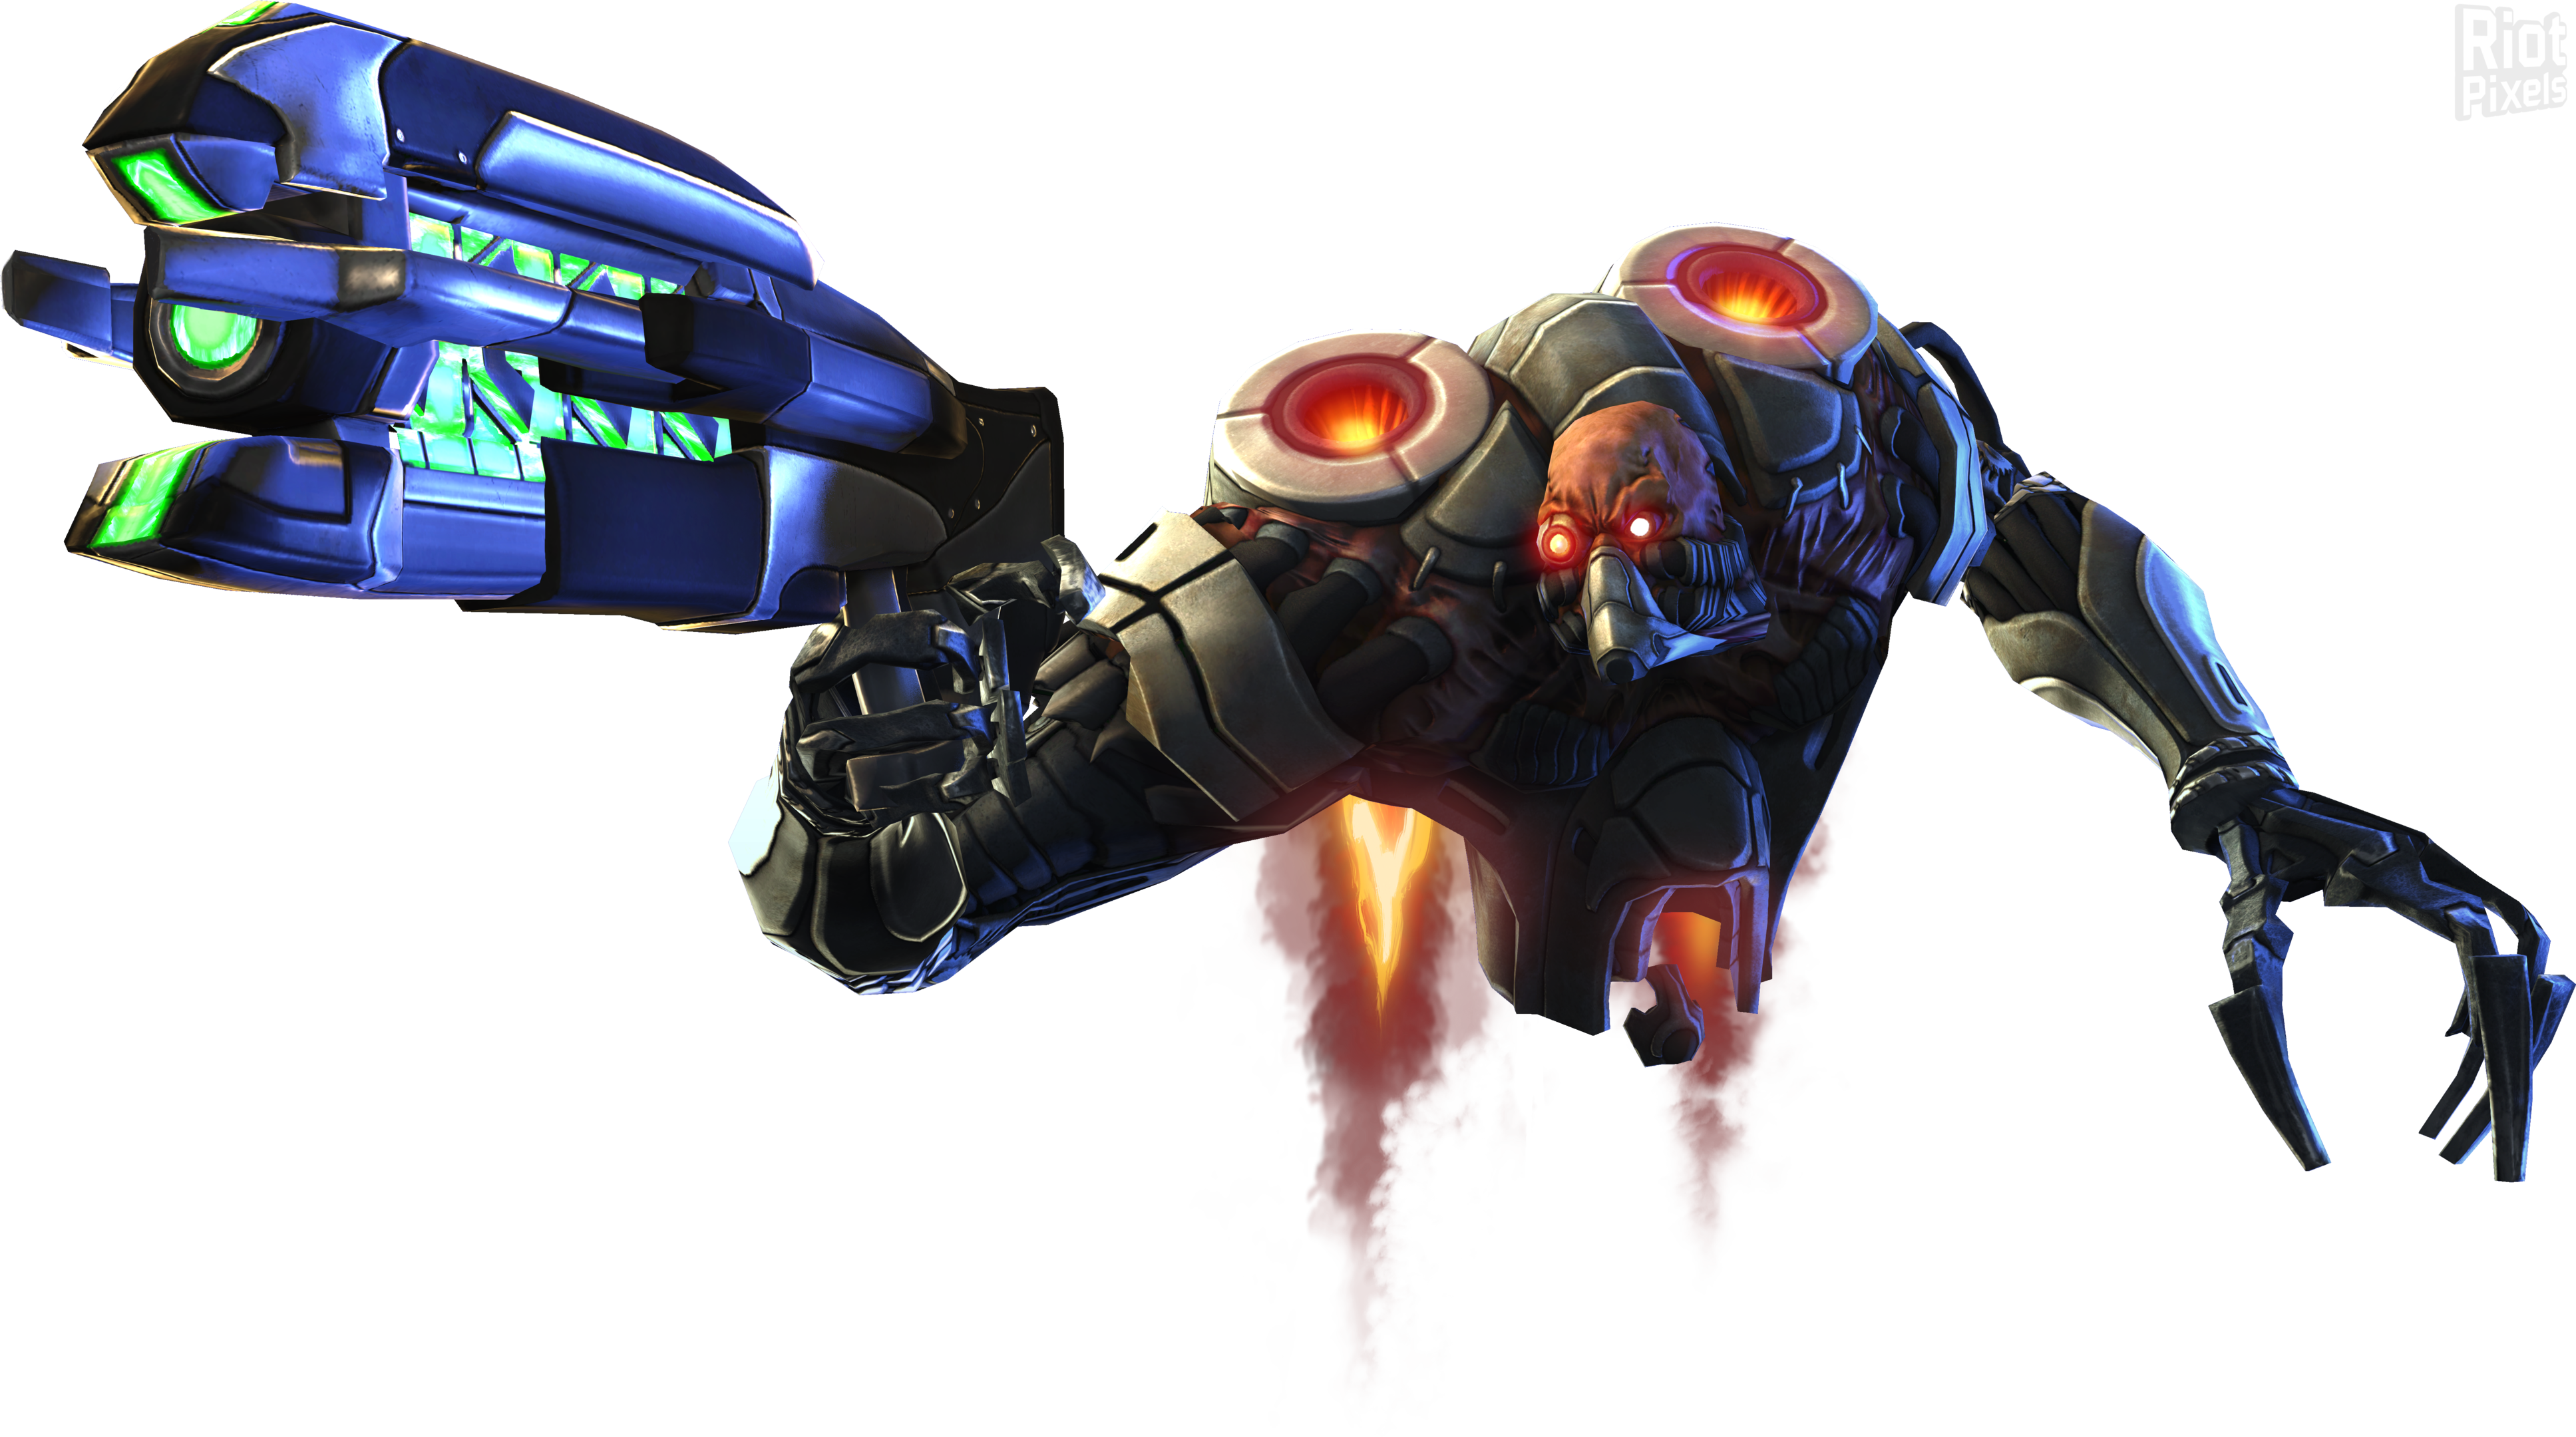 Xcom enemy unknown - elite edition - feral interactive ltd